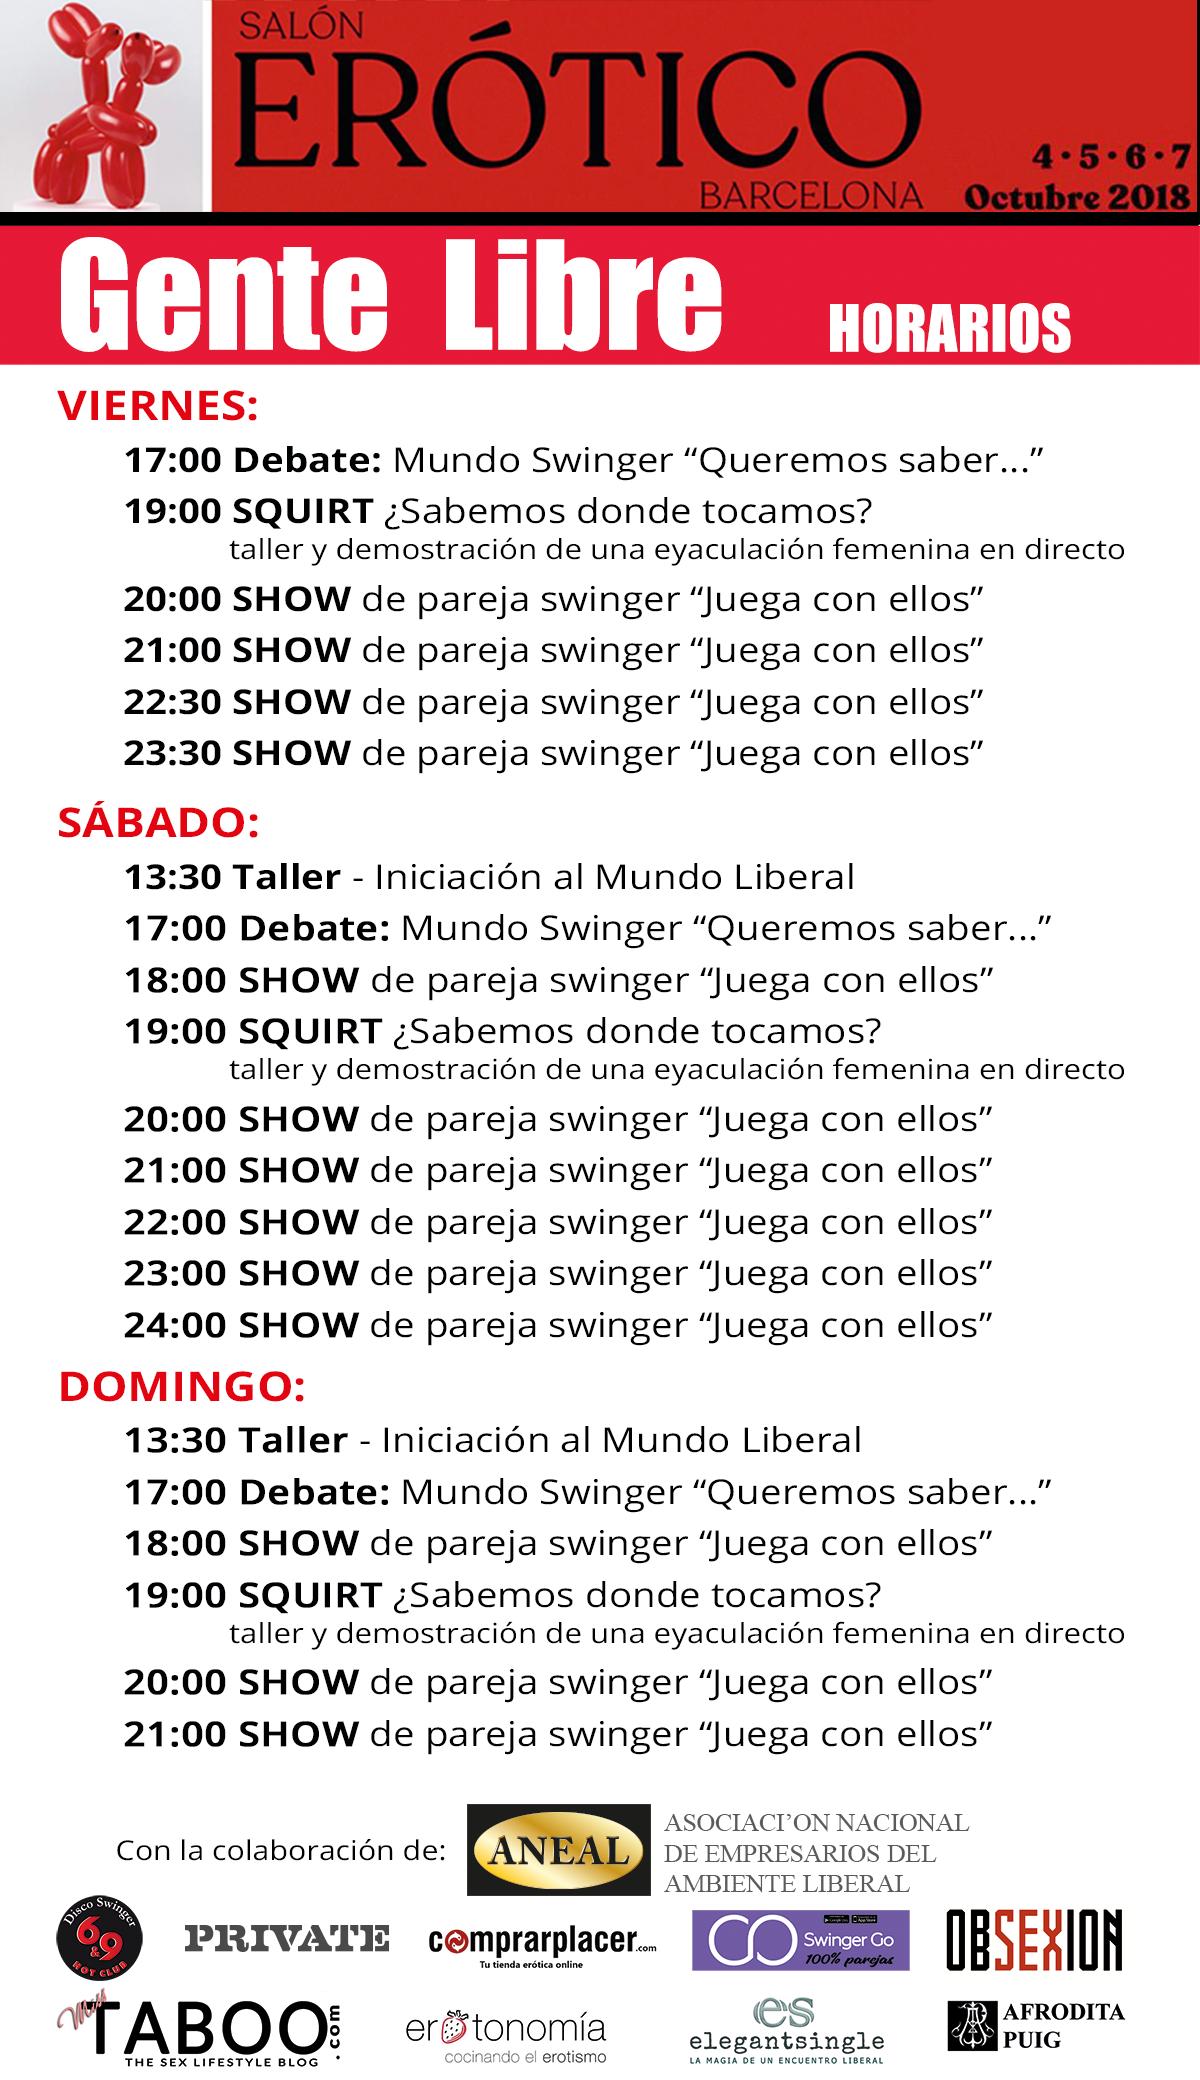 Horarios Gente Libre - Salón Erótico de Barcelona 2018